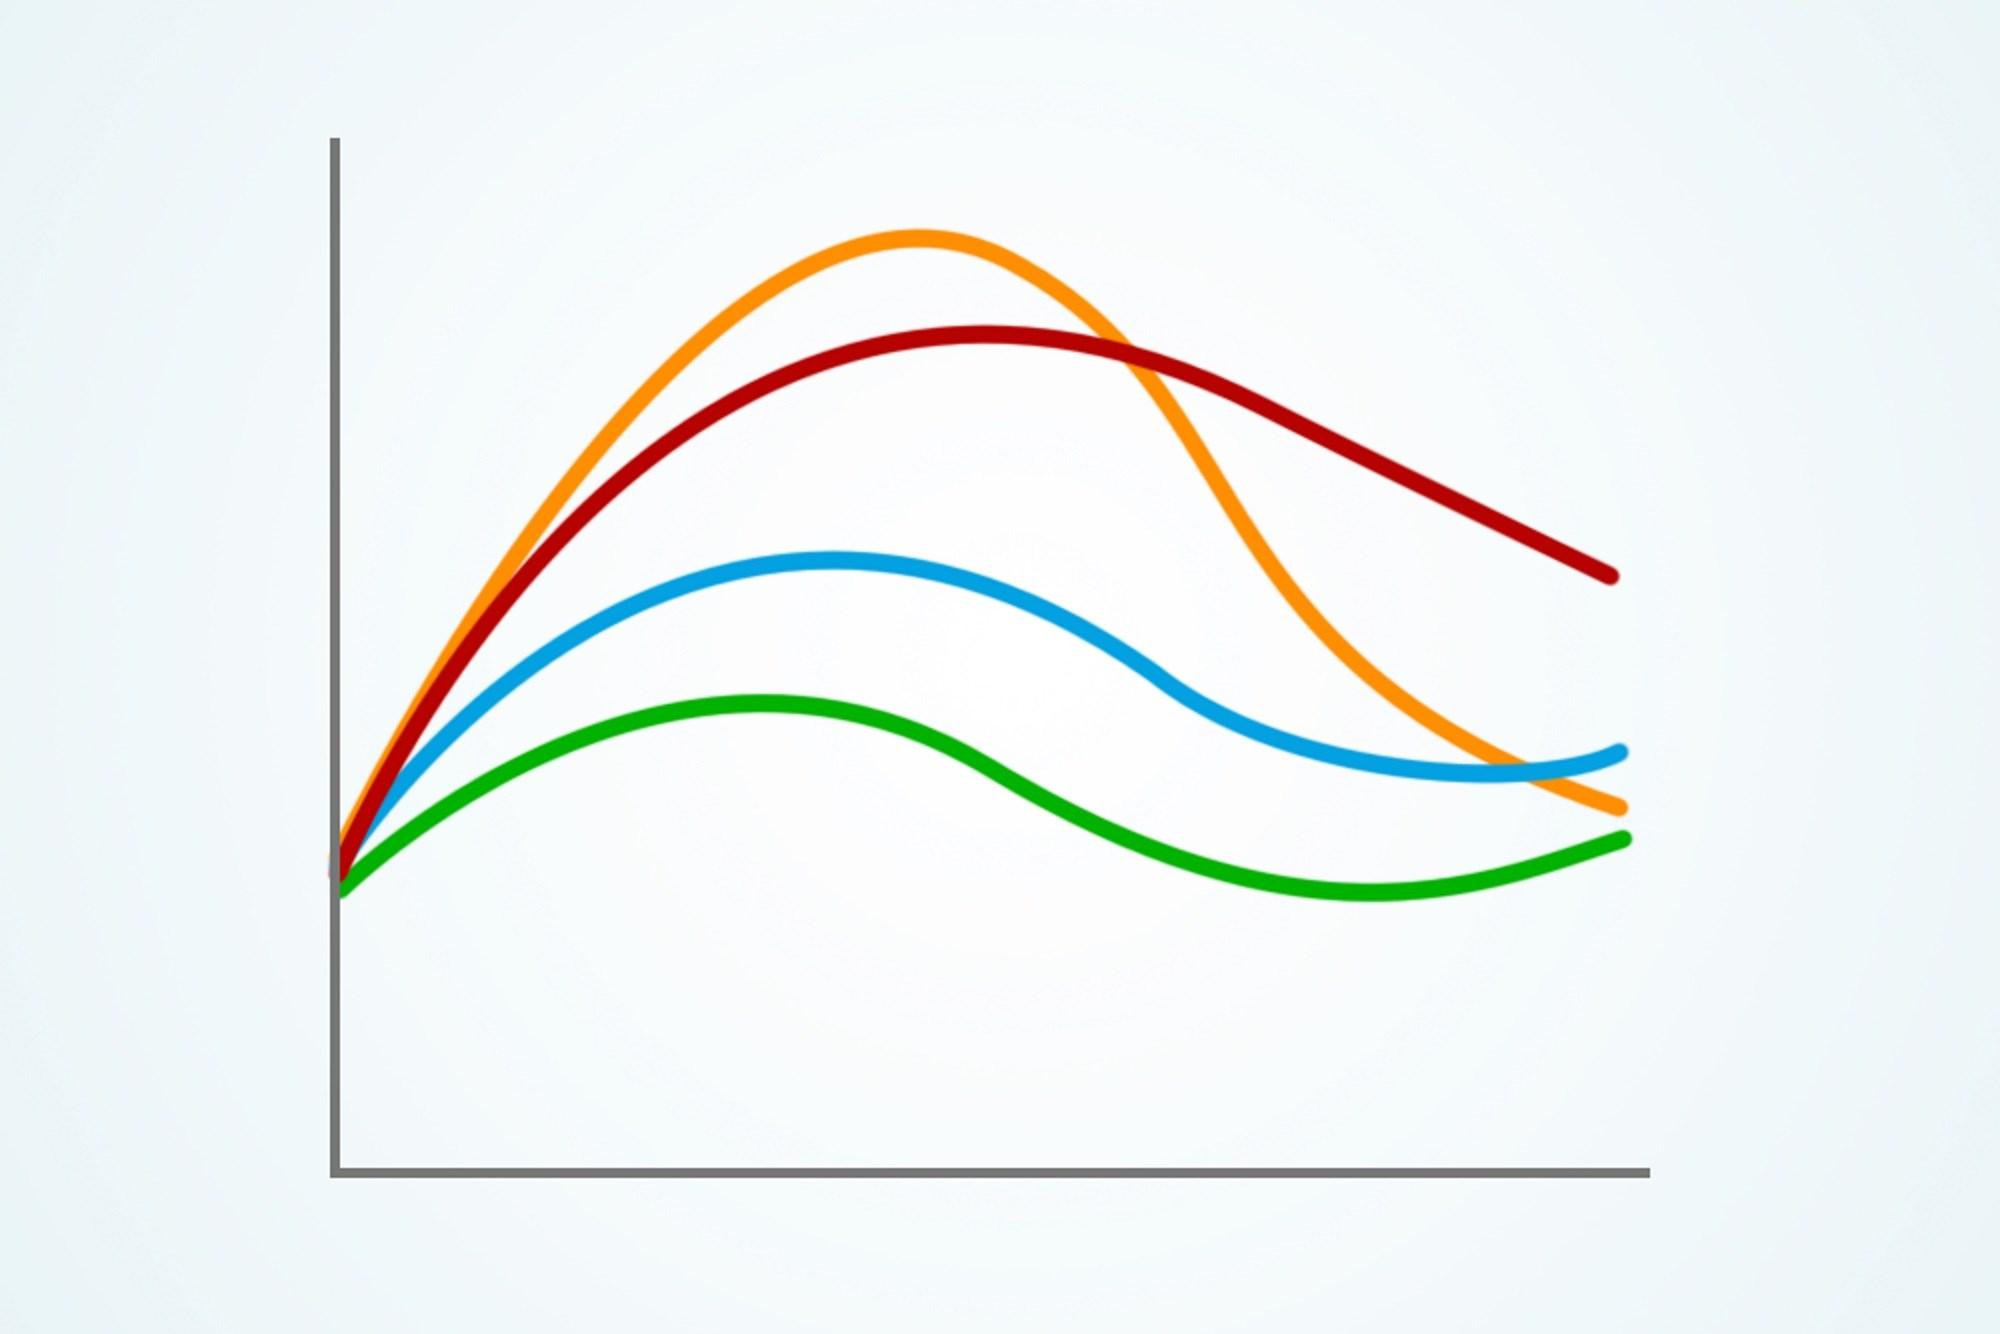 Investigators identified 4 glucose curve patterns that that differed in regard to insulin sensitivity, insulin secretion, obesity, plasma lipids, and low-grade inflammatory markers.